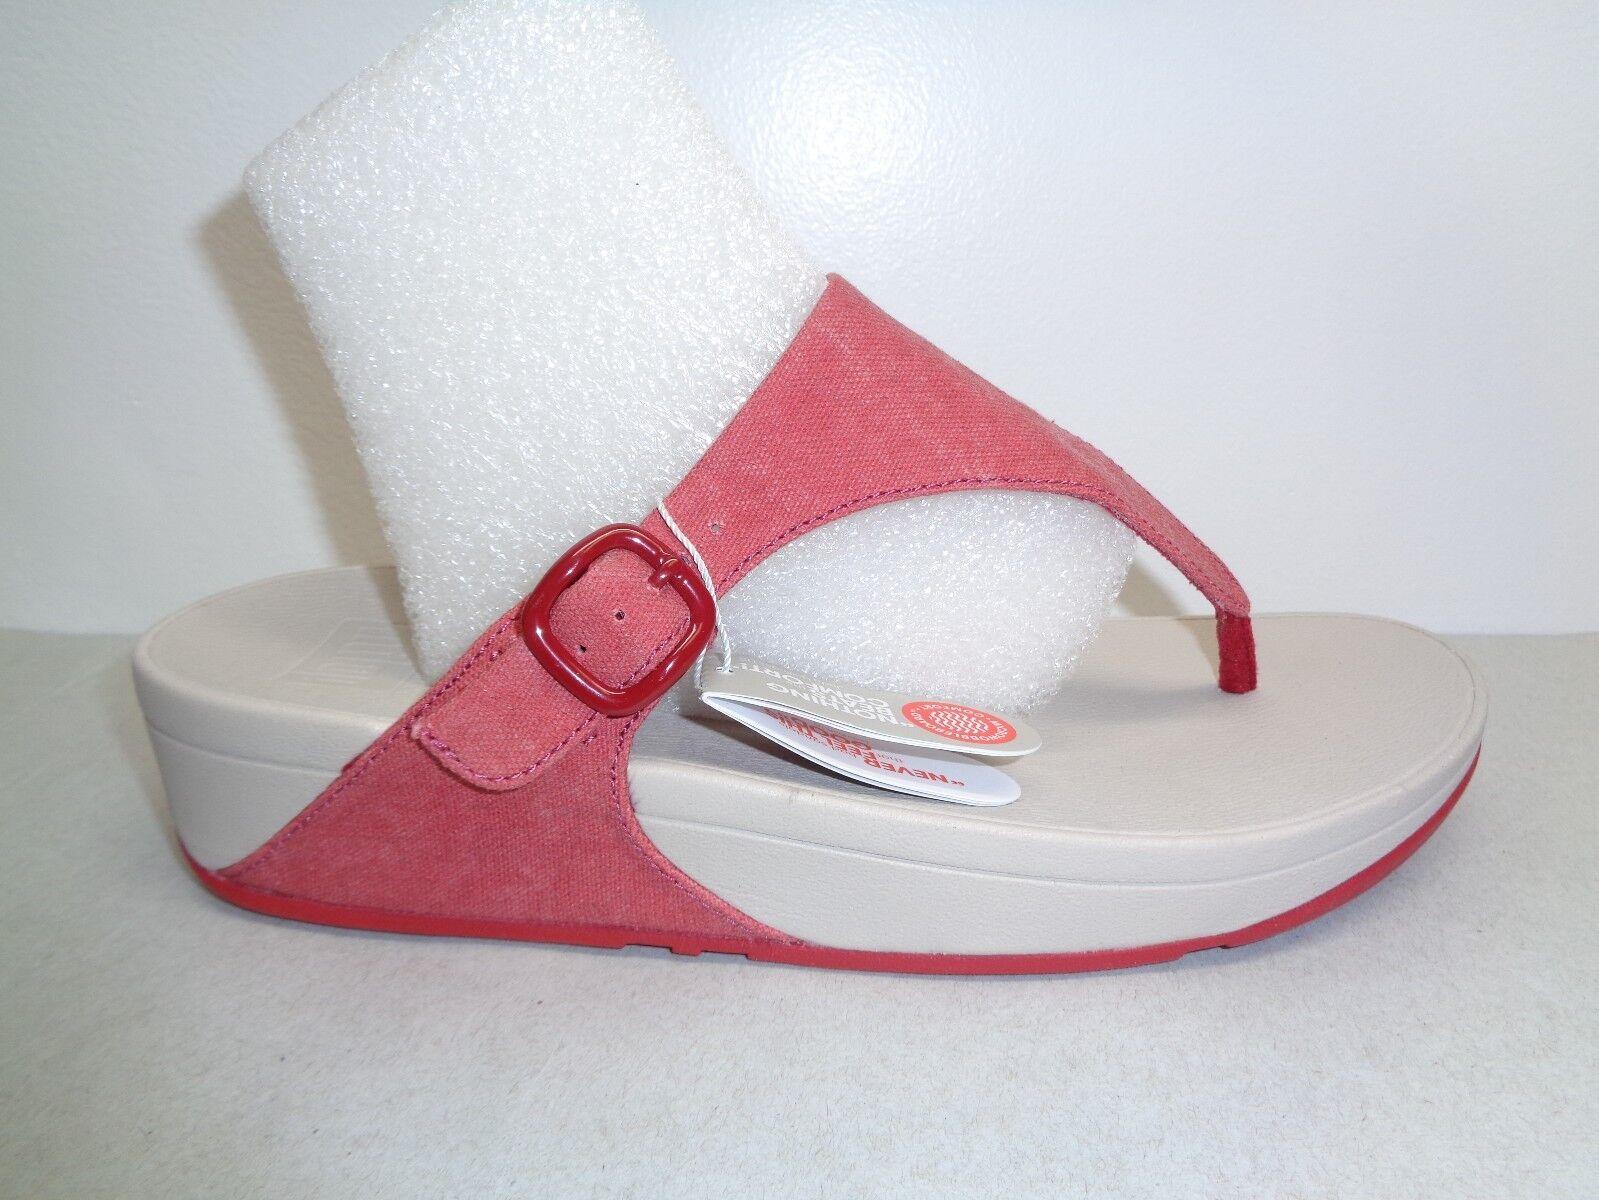 FitFlop Größe 9 THE SKINNY Classic ROT Thong Flip Flops Sandales NEU Damenschuhe Schuhes